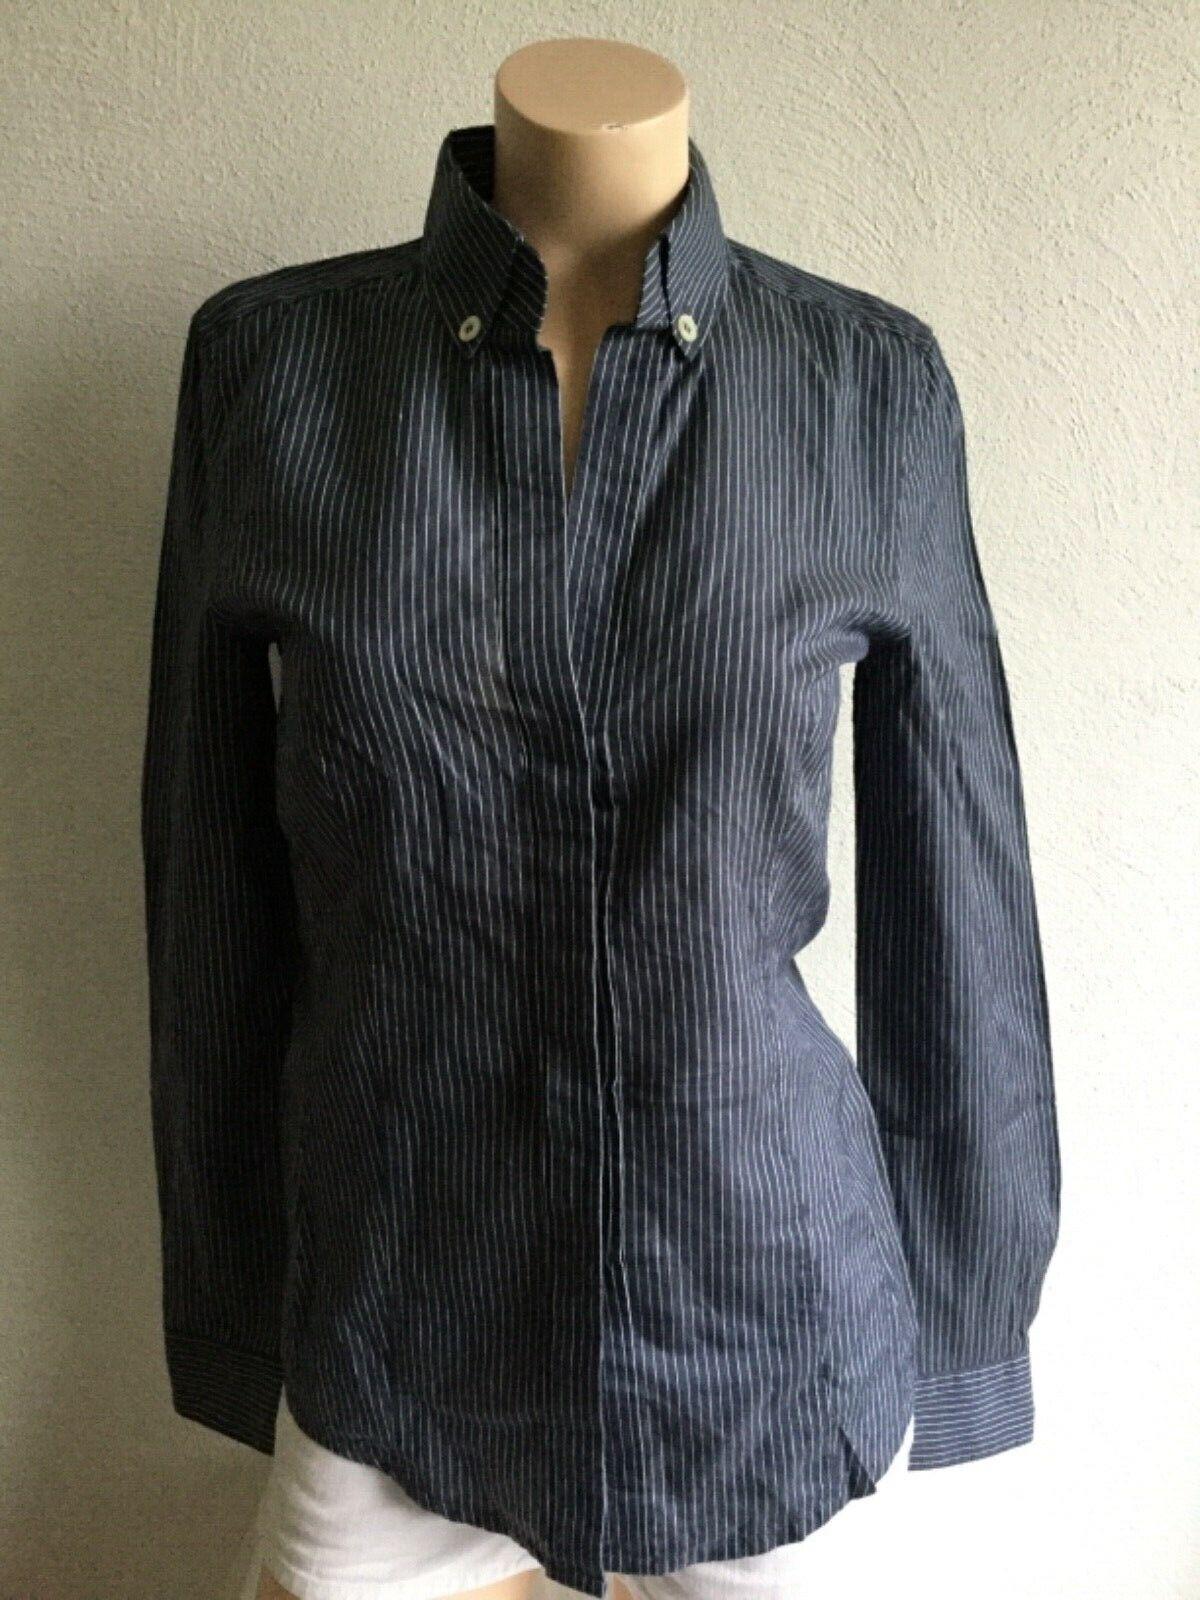 Windsor Damen Blause mit Seide Oberteil Shirt Gr. 32